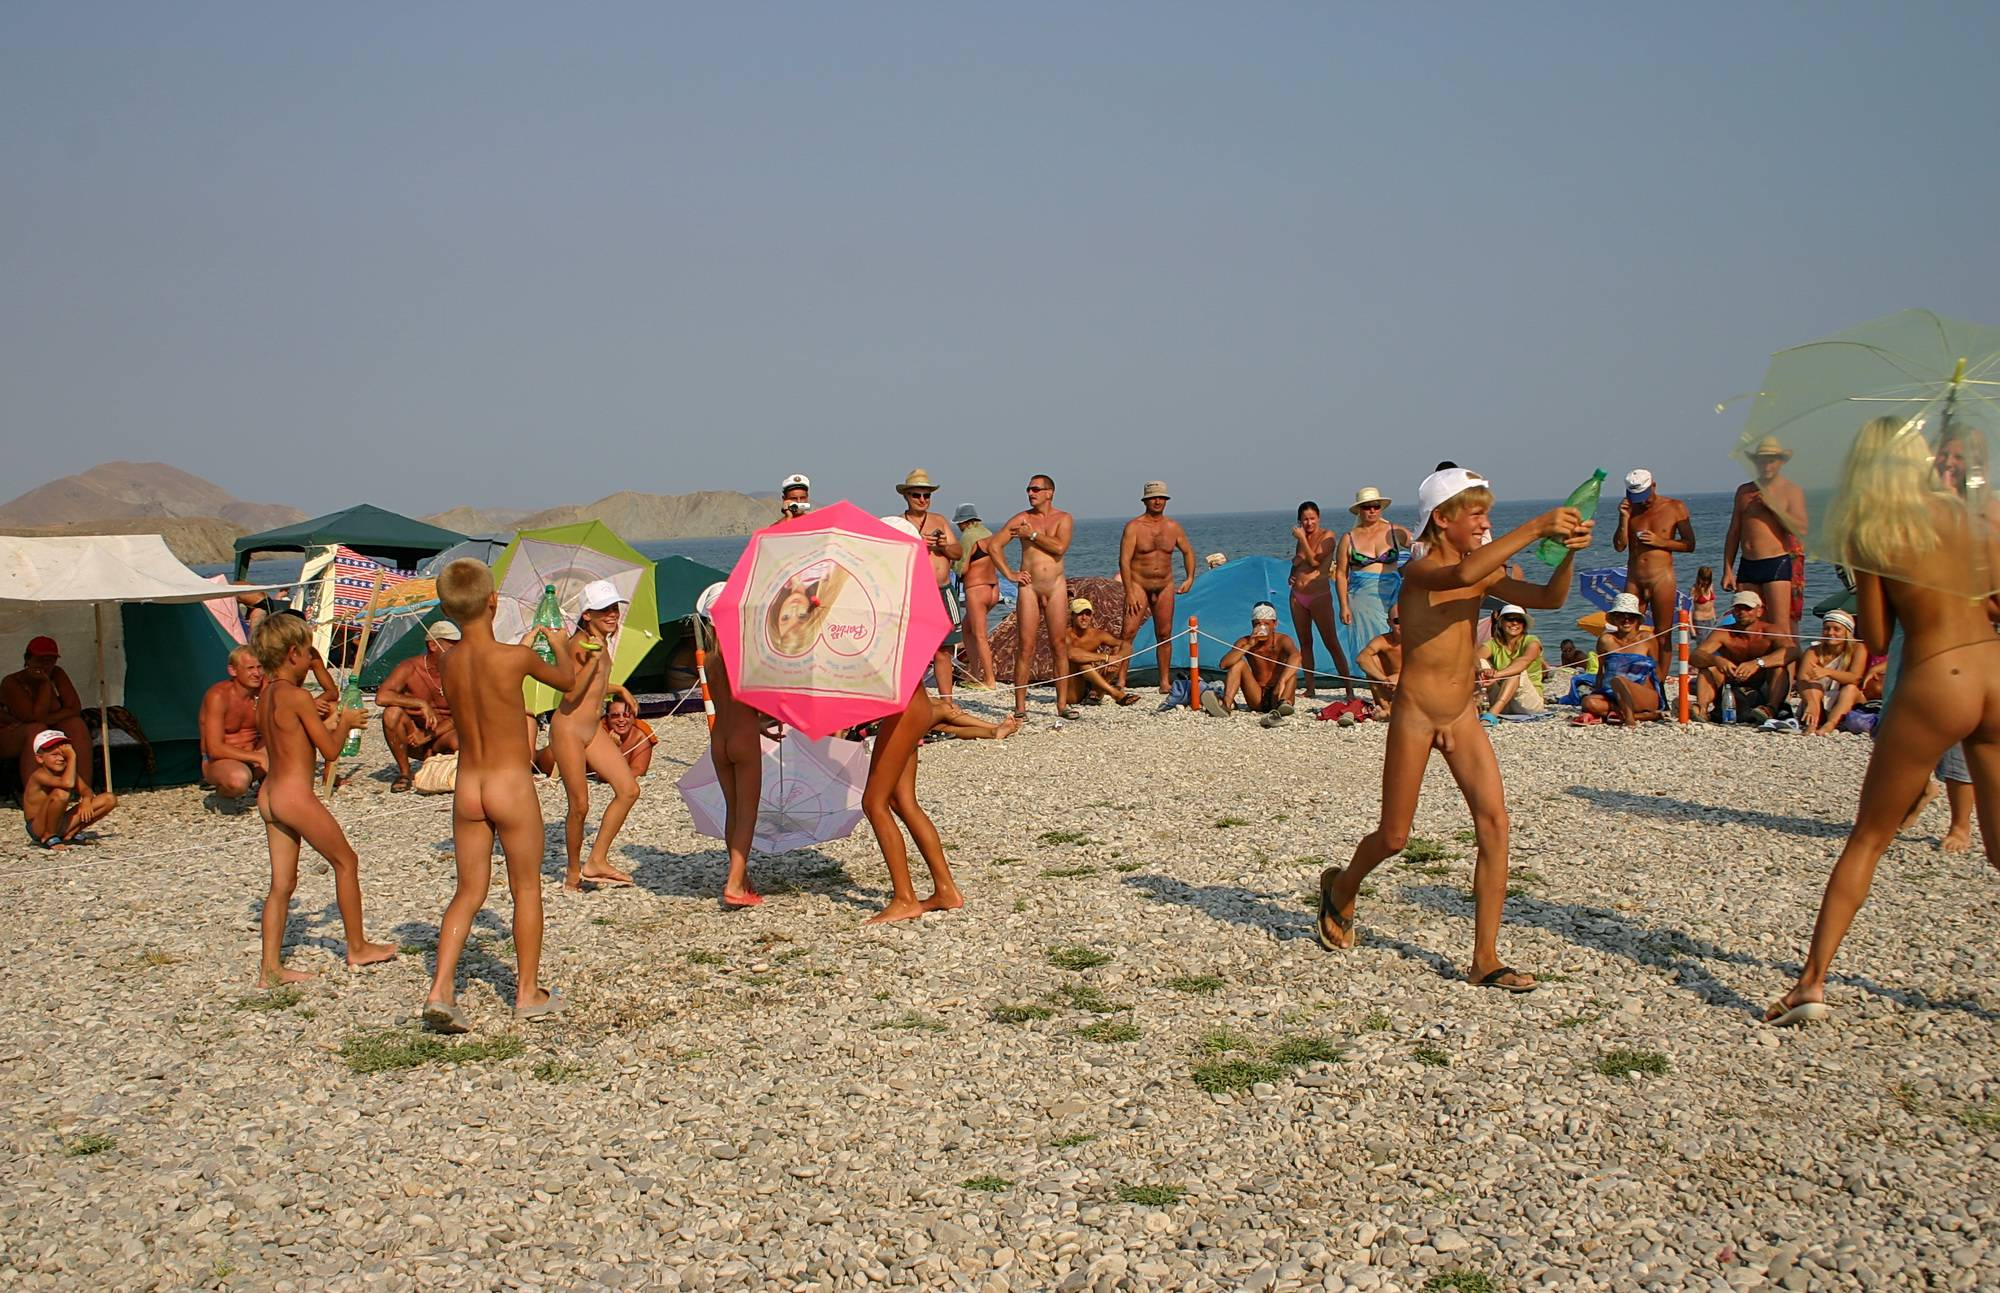 Nudist Photos Ribbon and Umbrella Dance - 2